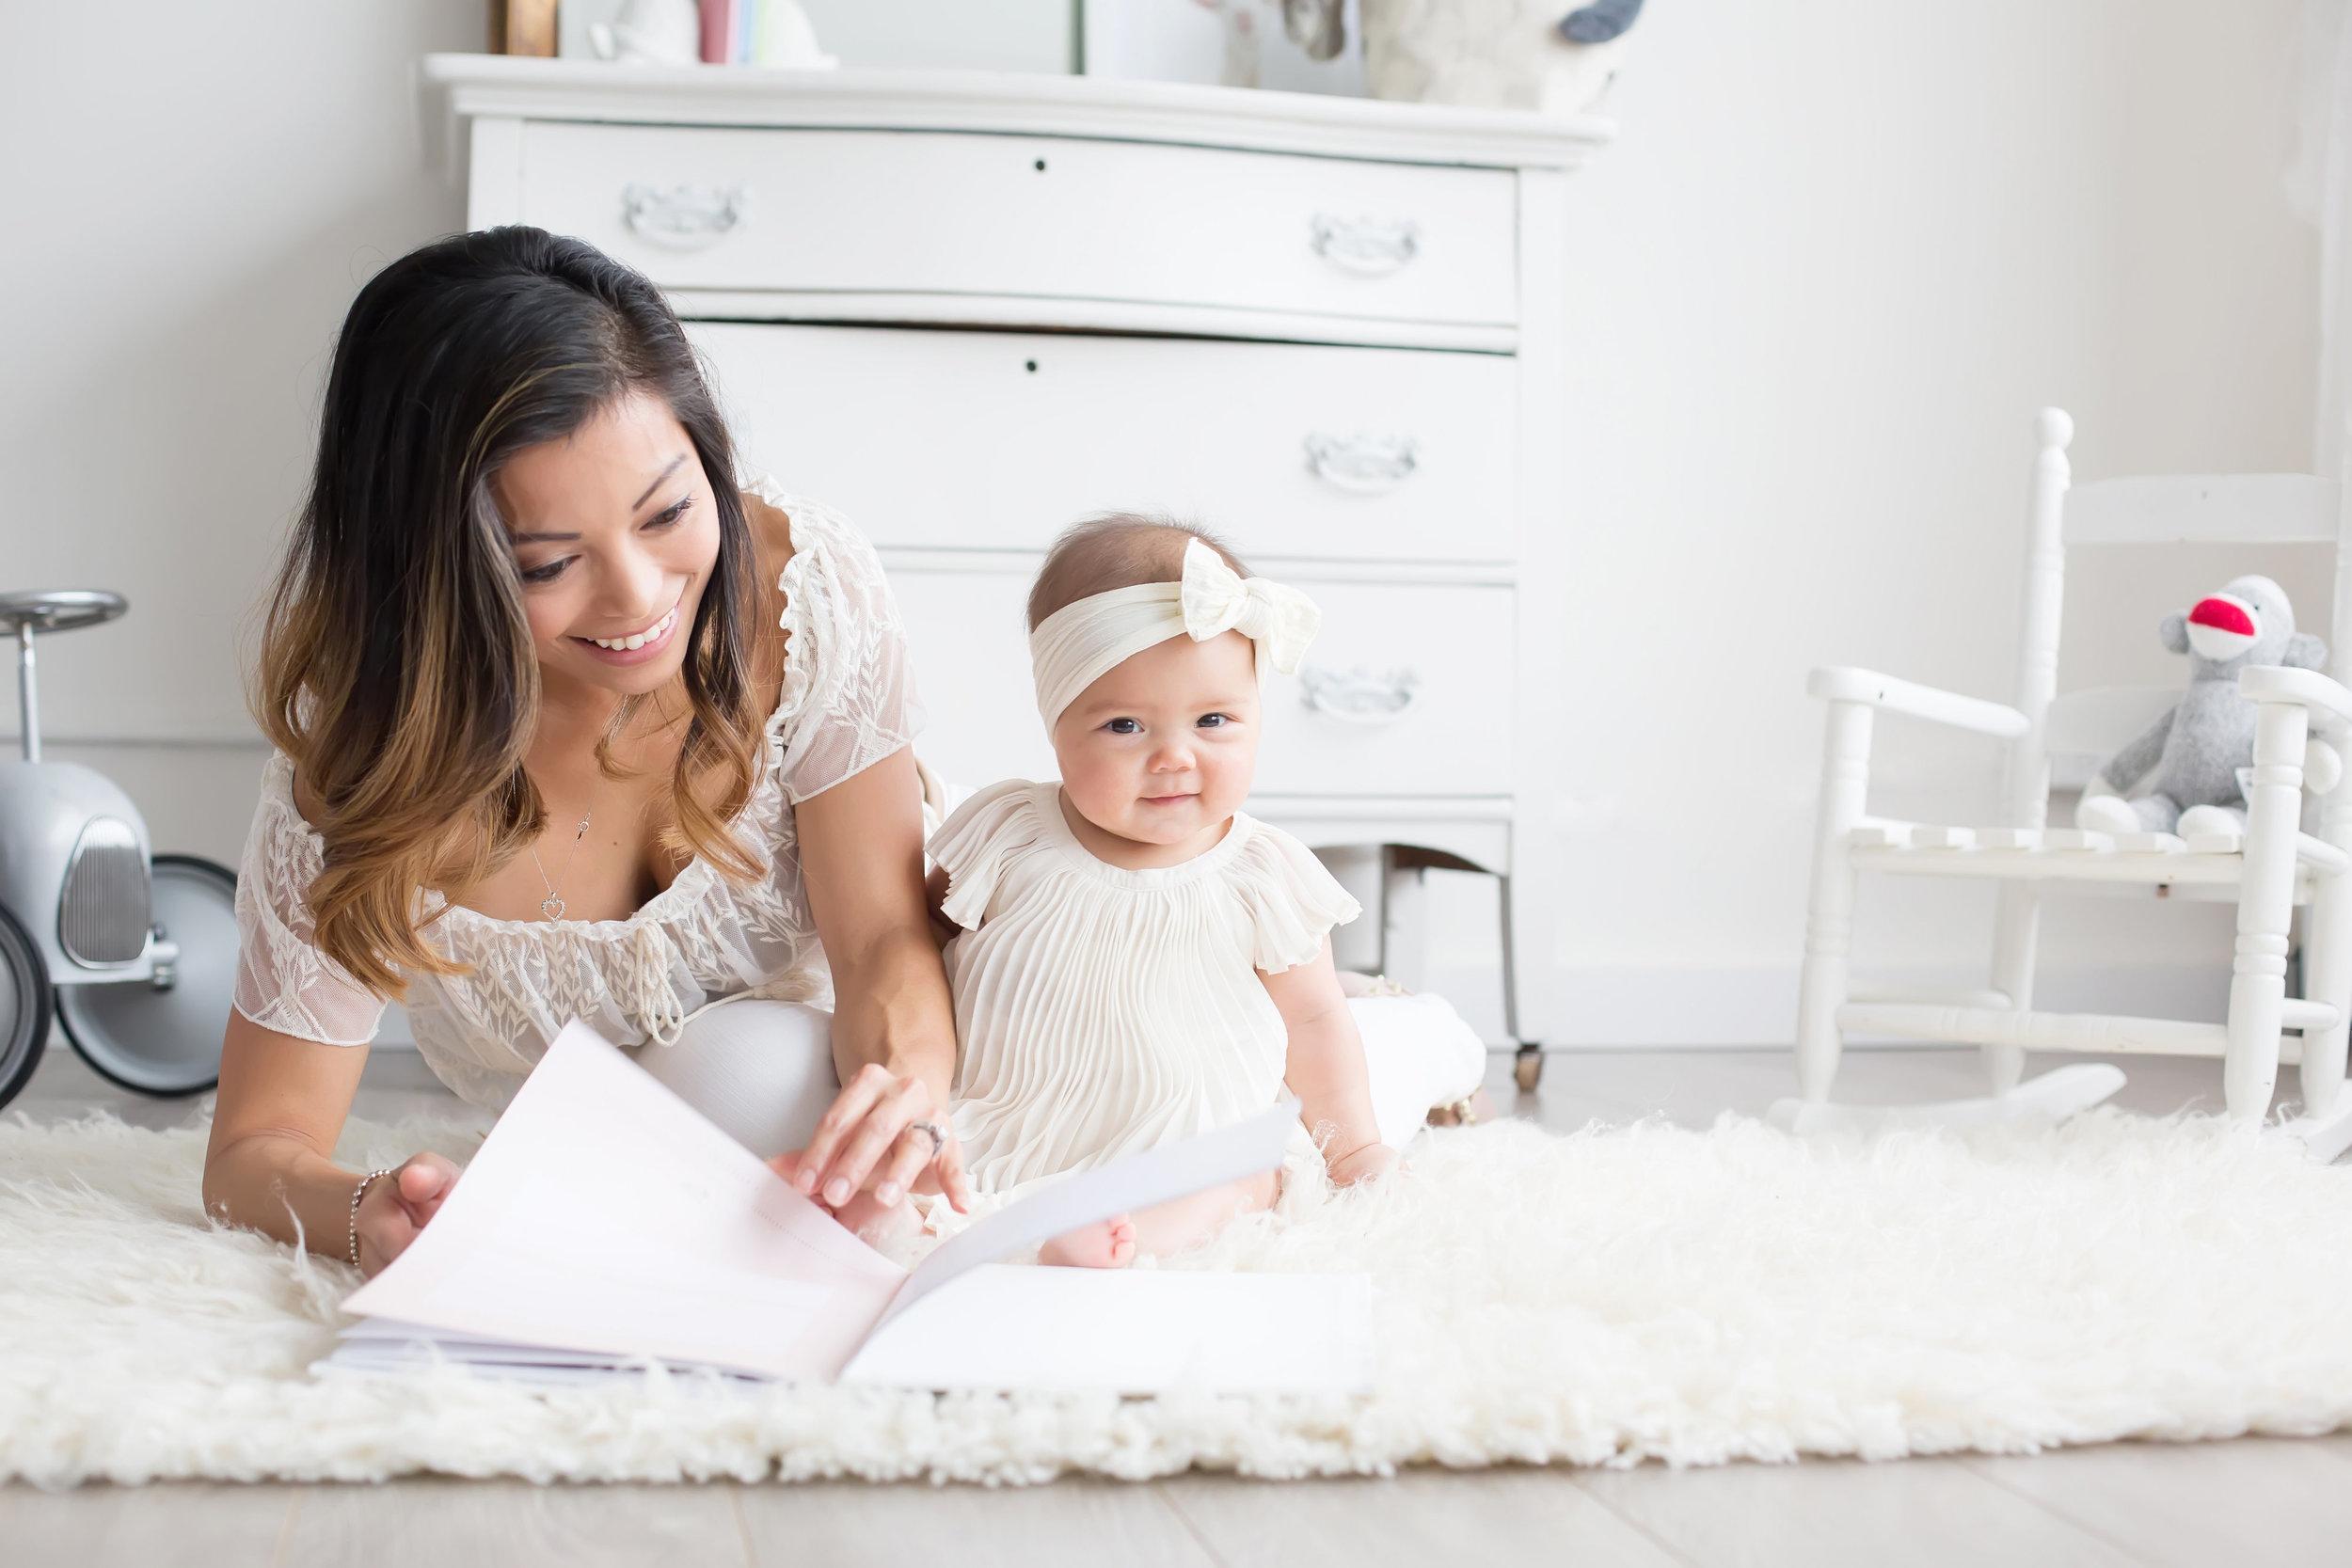 Mushybooks Modern Baby Books - it's never to late to start